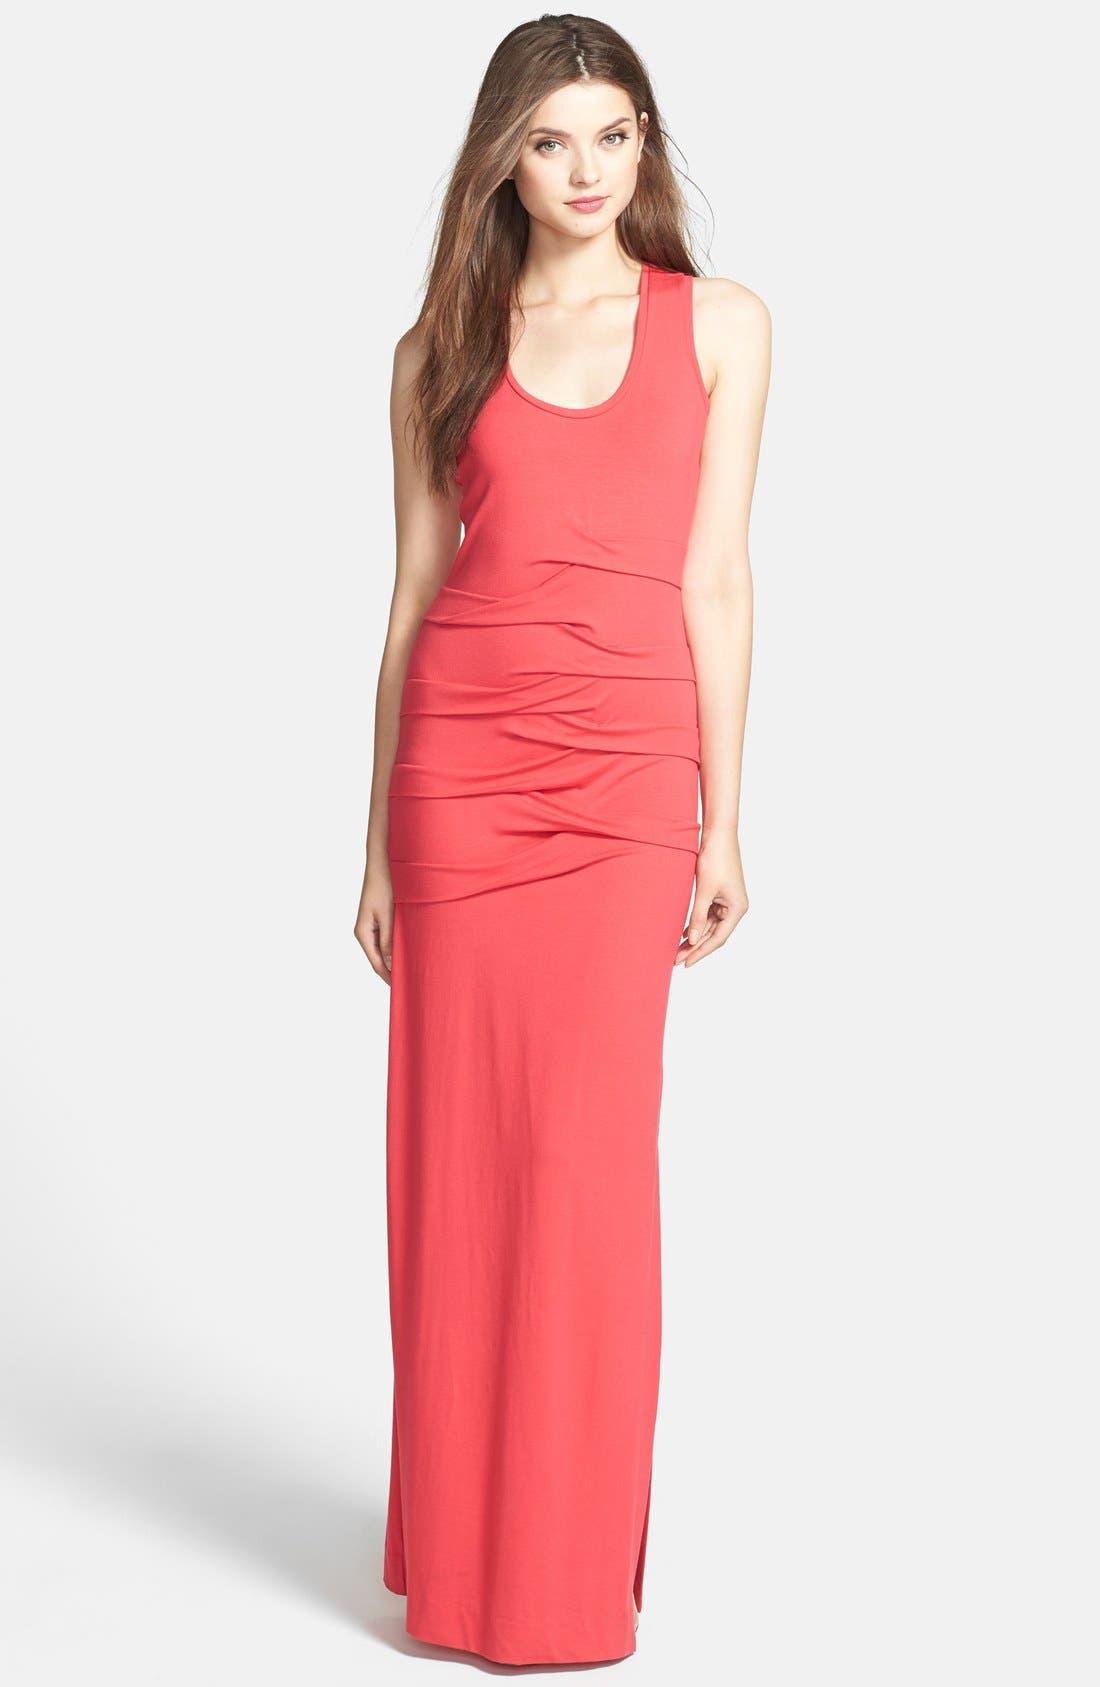 Main Image - SLEEVELESS SCOOP SLIM-FIT MAXI DRESS